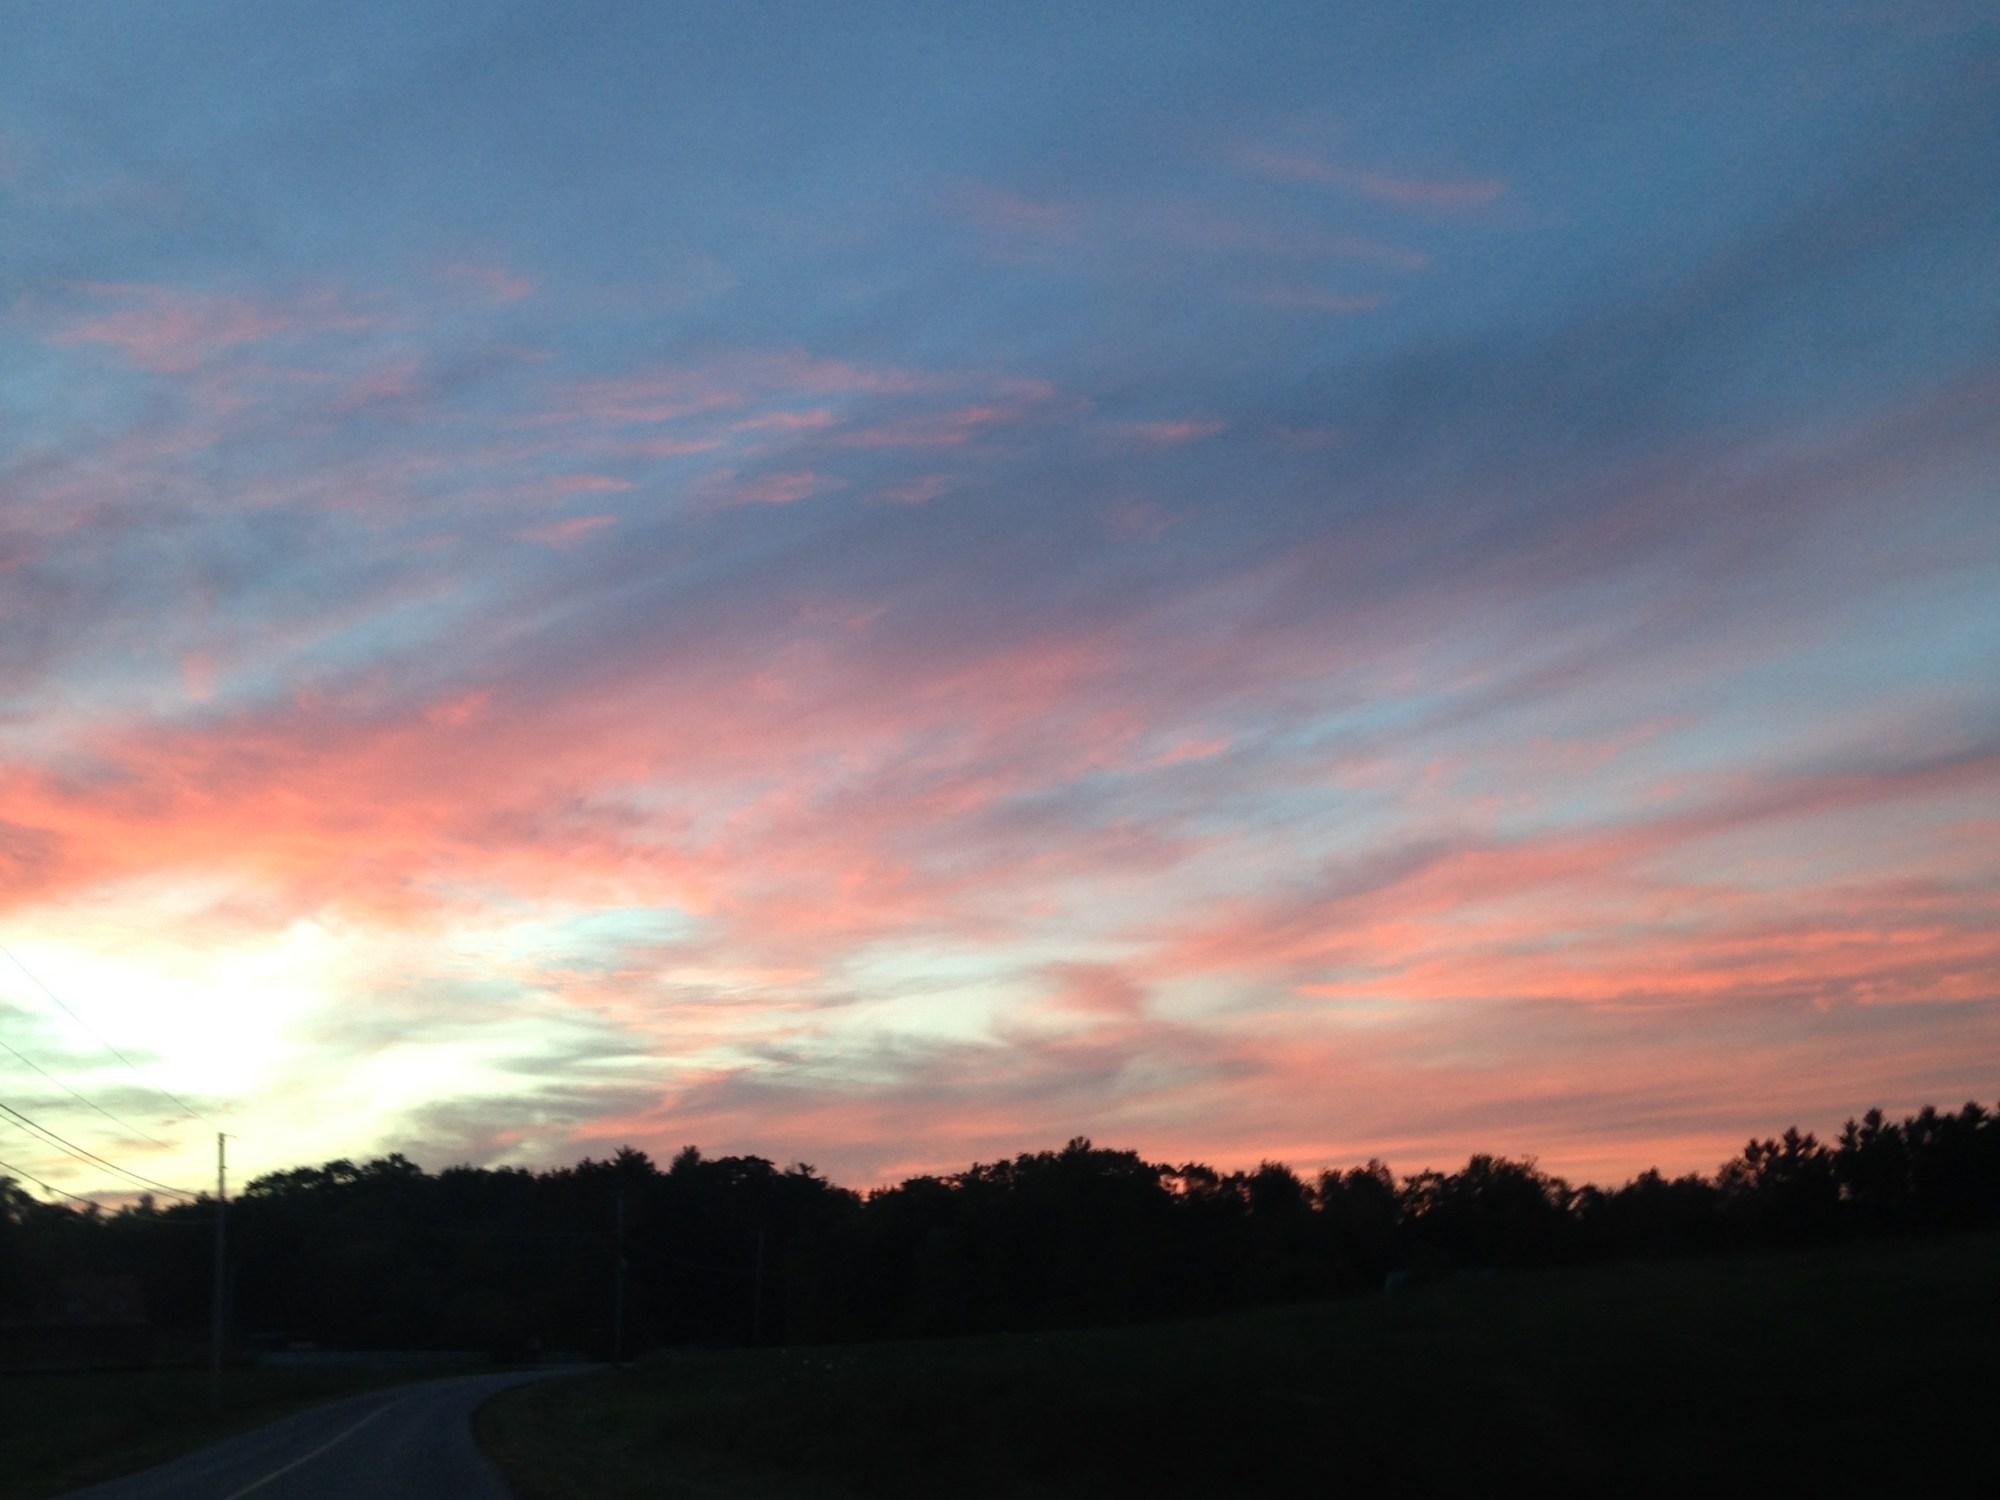 Sunset in Maine